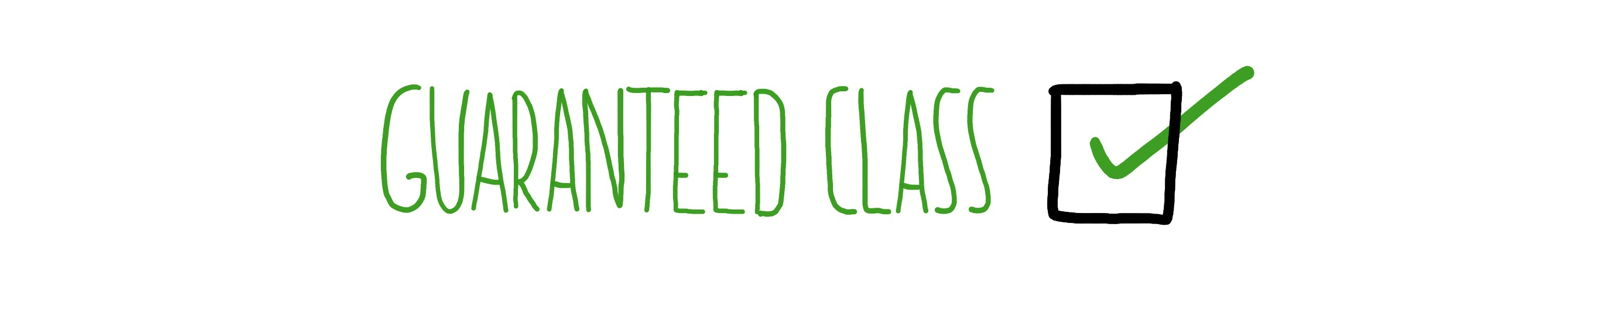 Guaranteed training class: 📅 Professional Scrum Master Training PSM I — Berlin, April 7-8, 2020